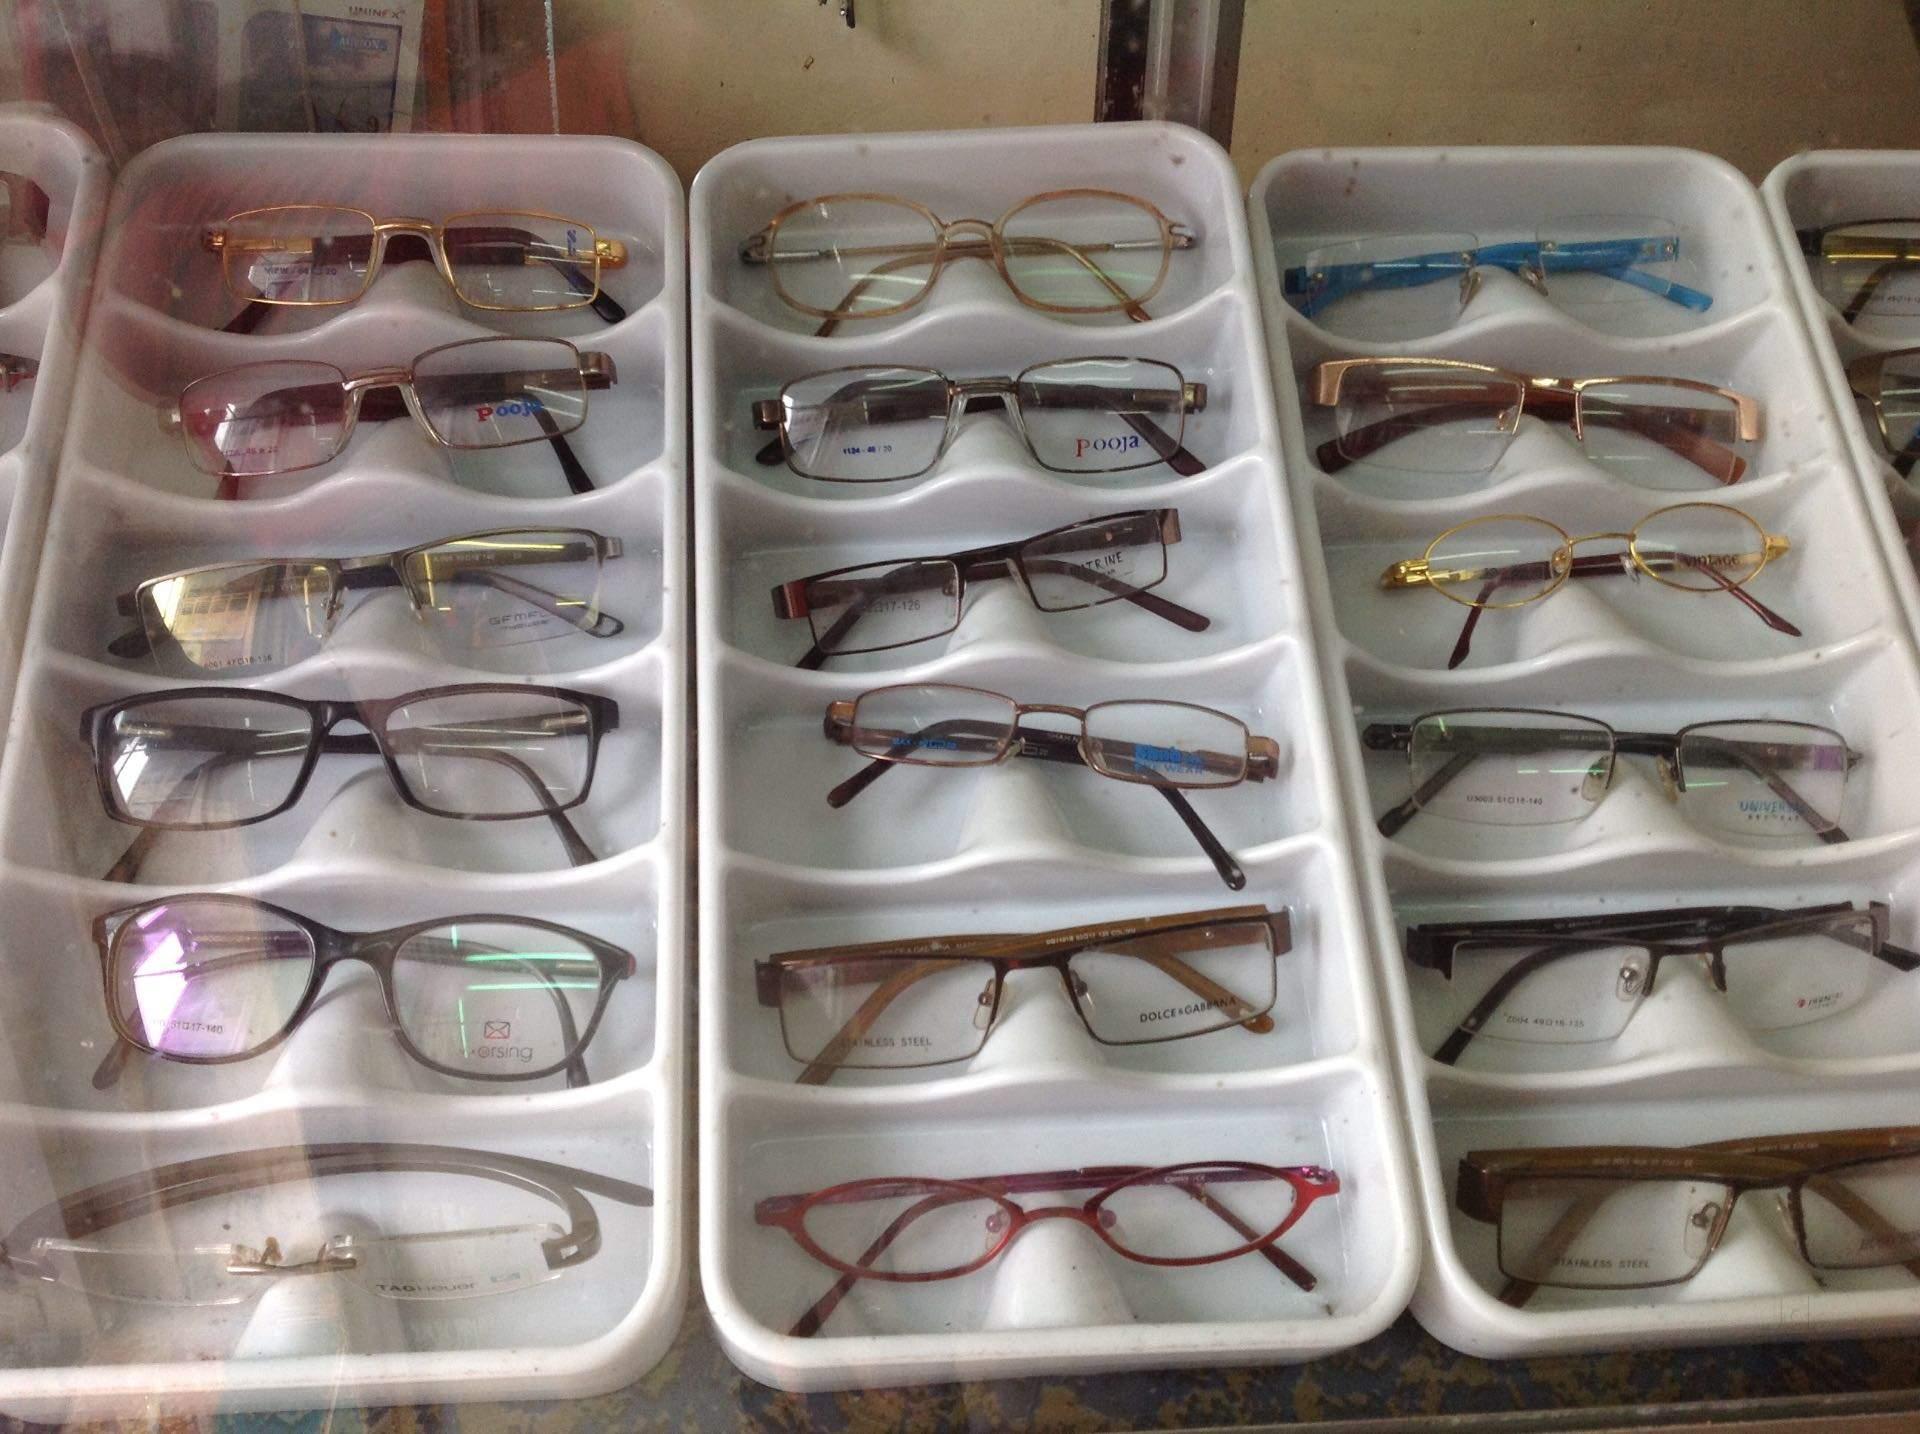 b47379ad3059 Top 100 Crizal Spectacle Lens Dealers in Amrut Nagar-Ghatkopar West ...